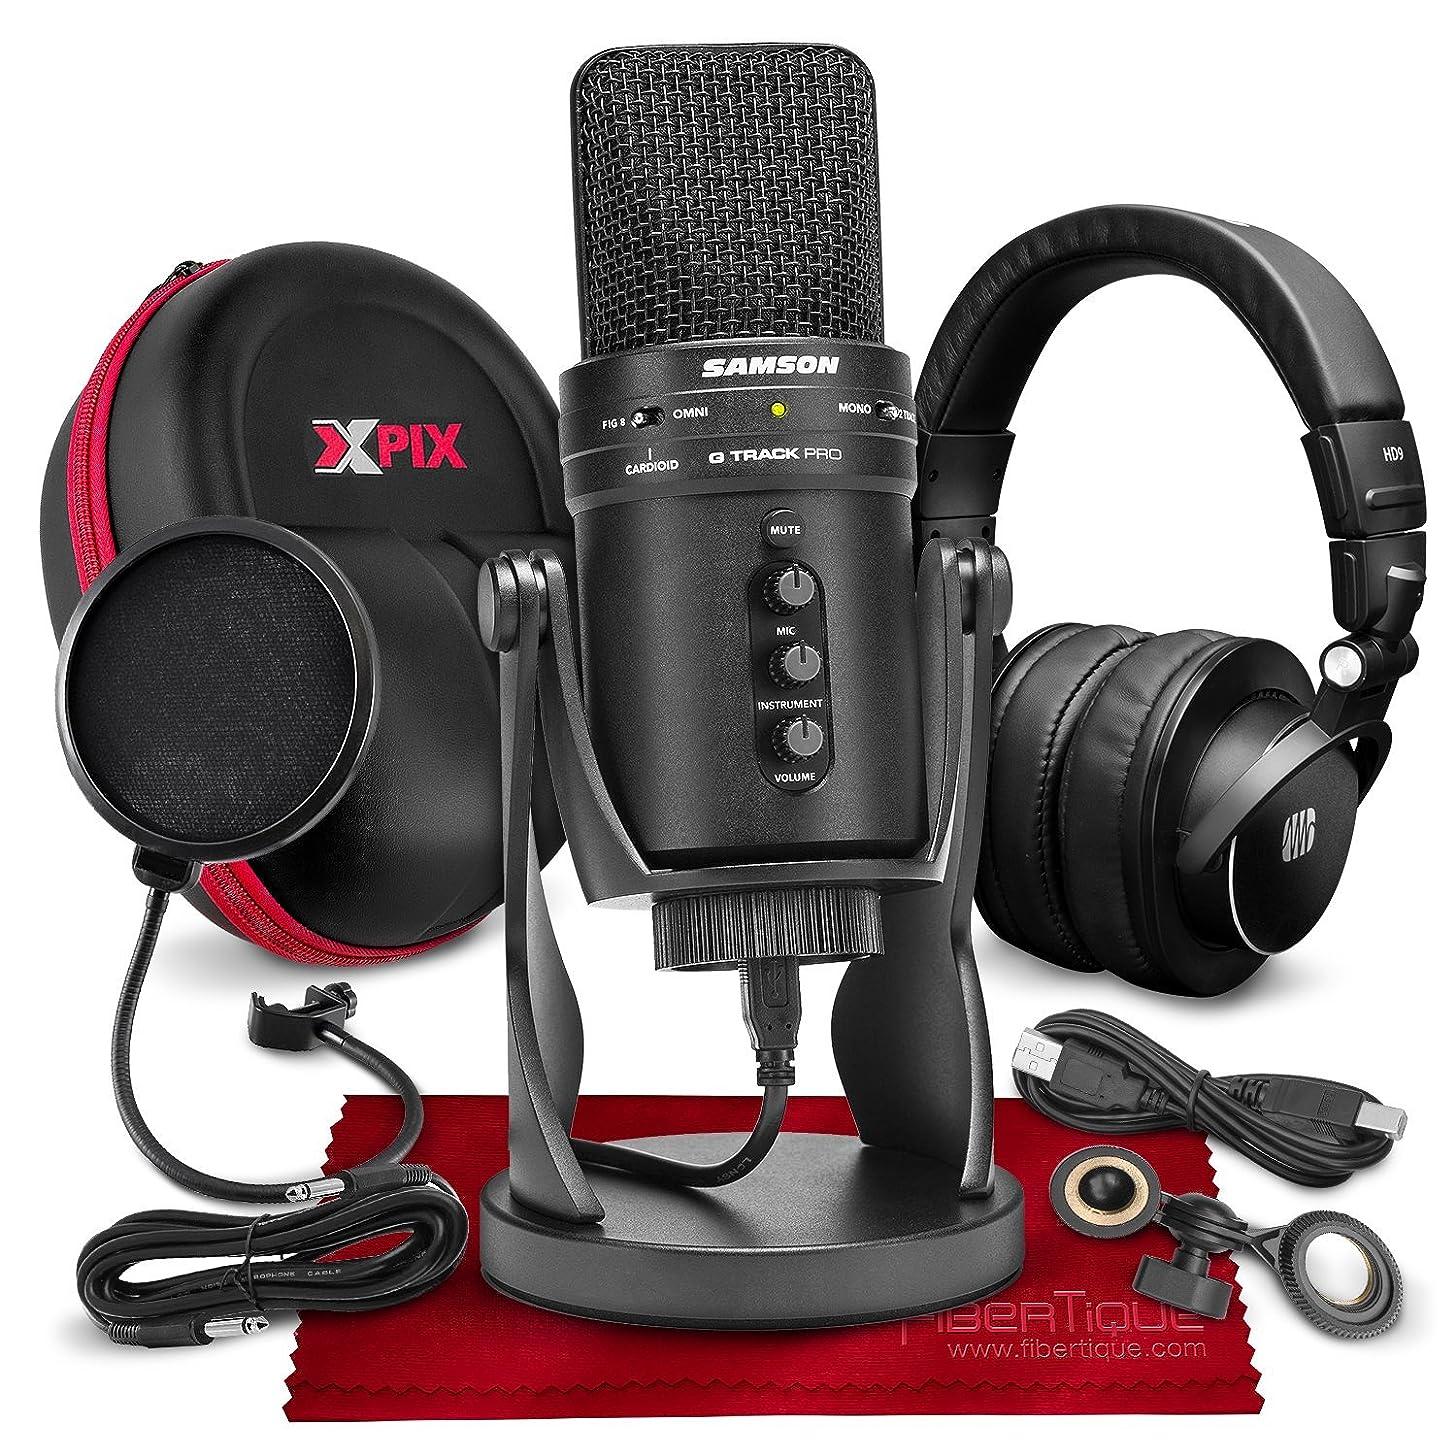 Samson G-Track Pro Professional USB Condenser Microphone w/Audio Interface Bundled with PreSonus HD9 Pro Headphones, Mic Pop Filter, Headphones Case, and Accessories